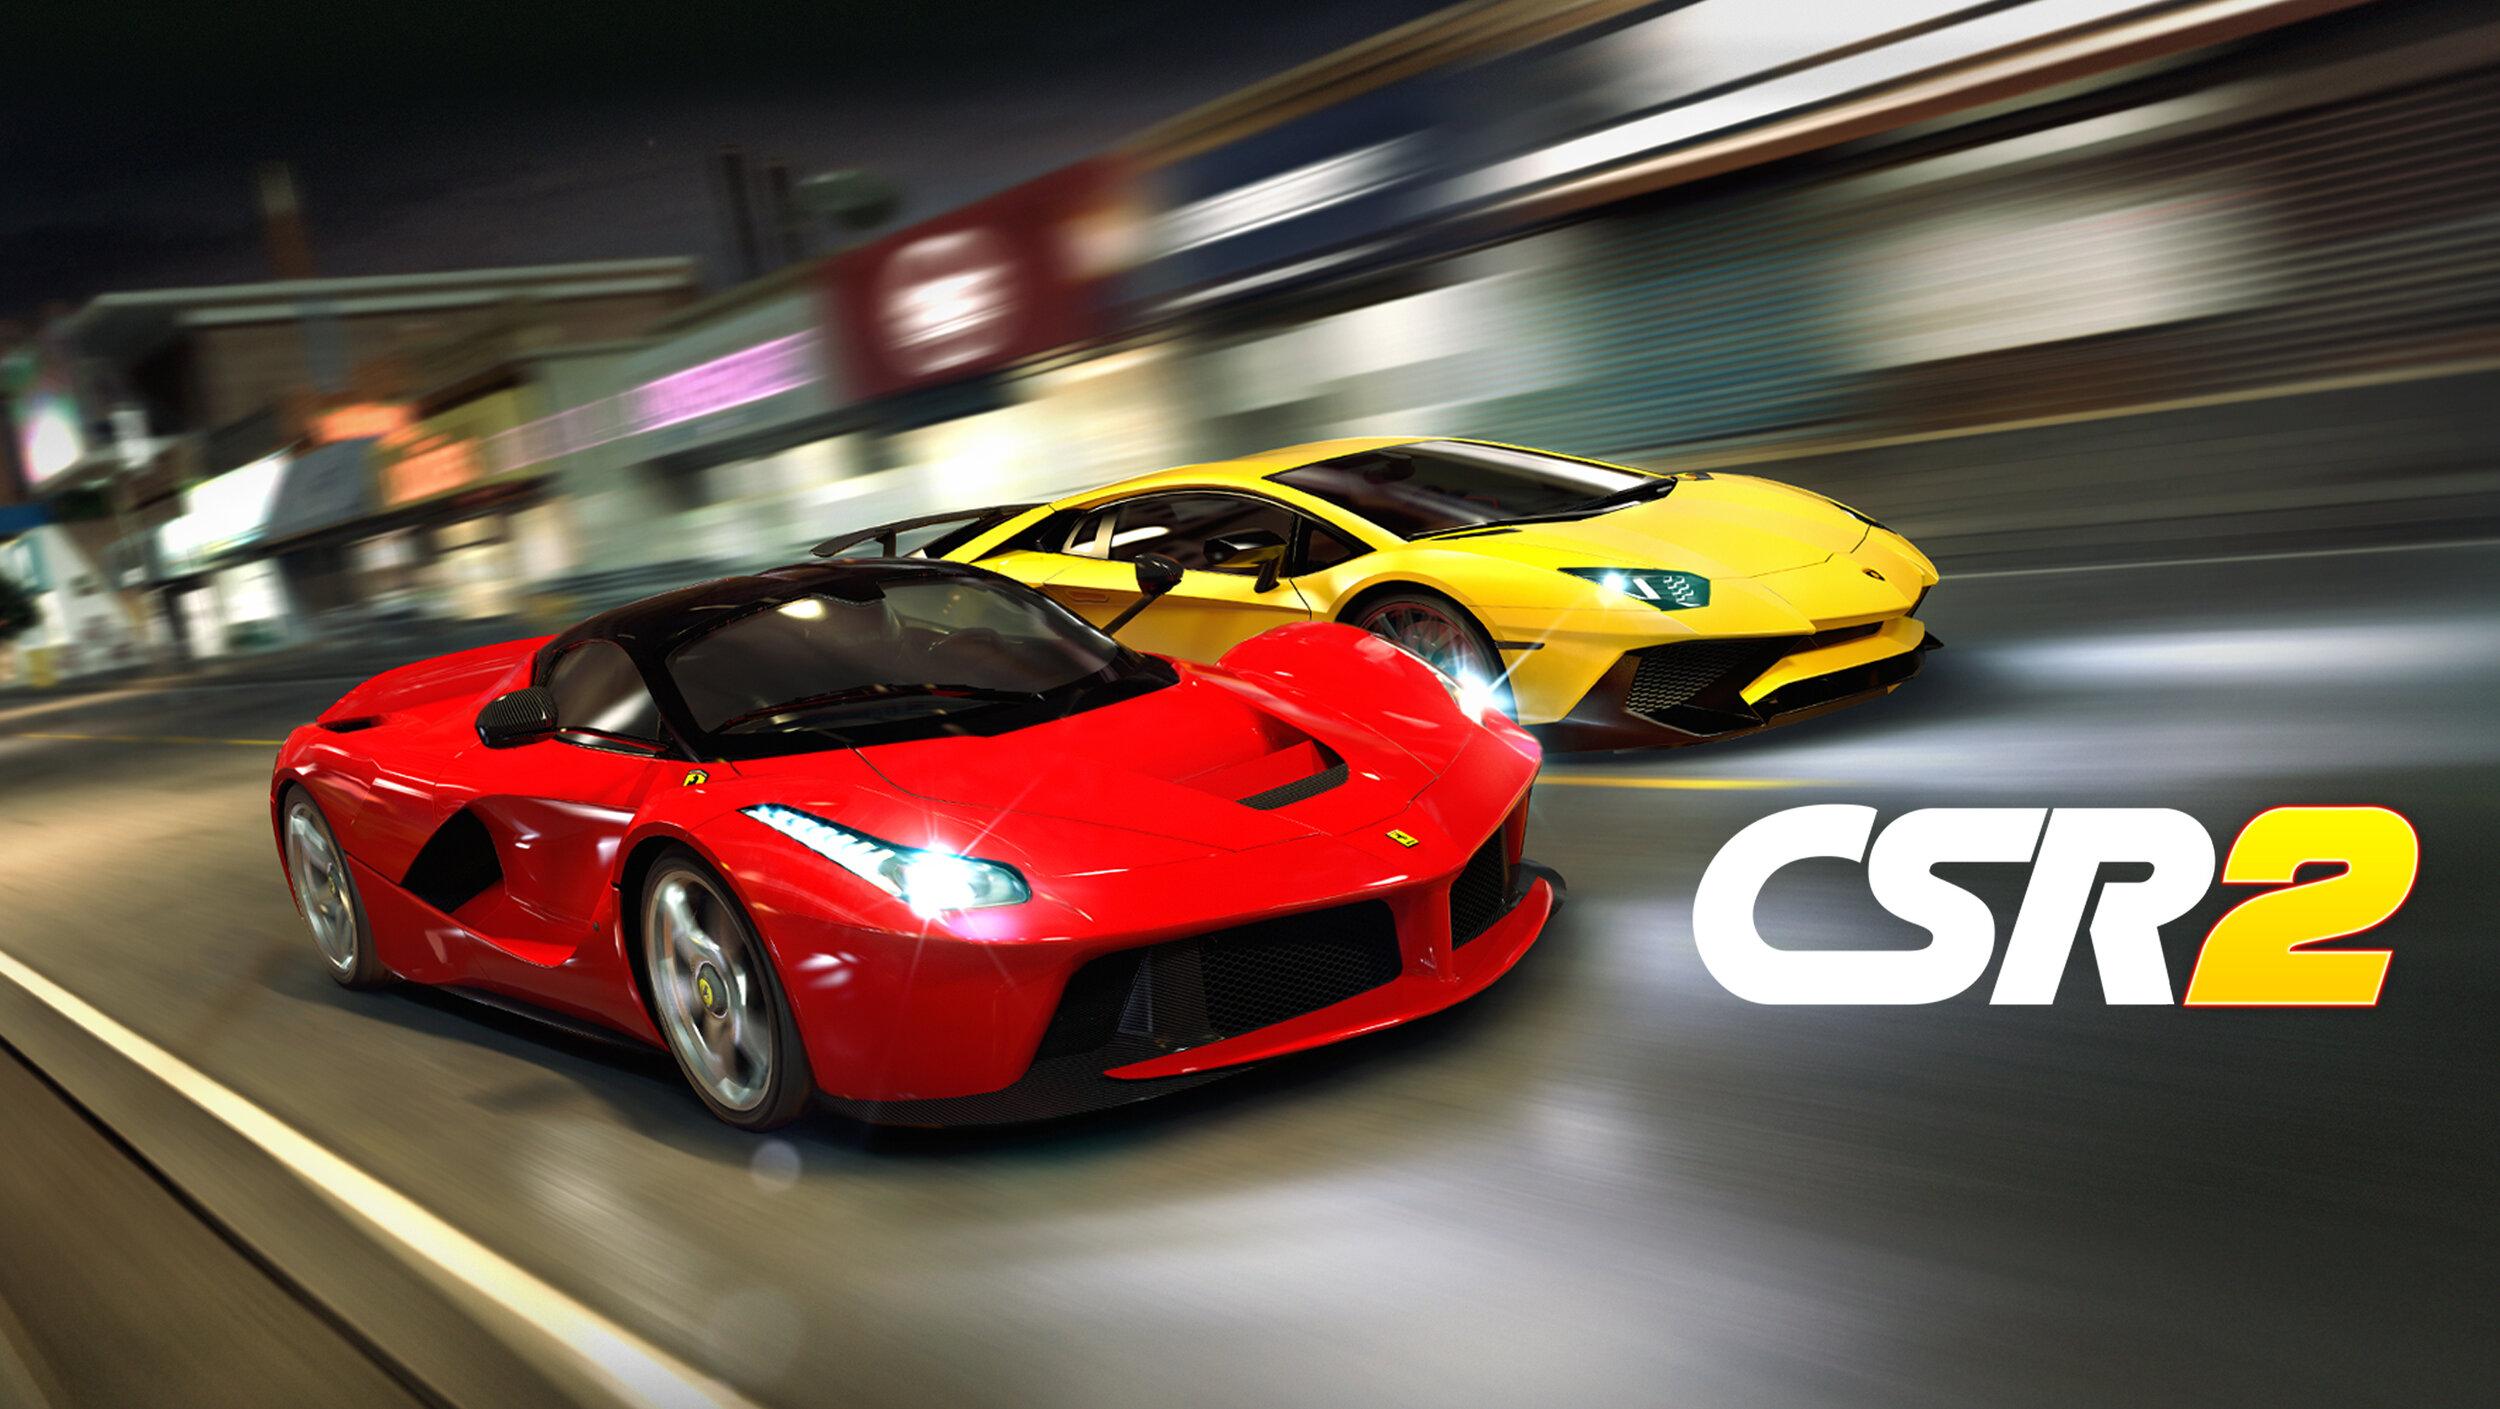 CSR2_Ferrari_race.jpg